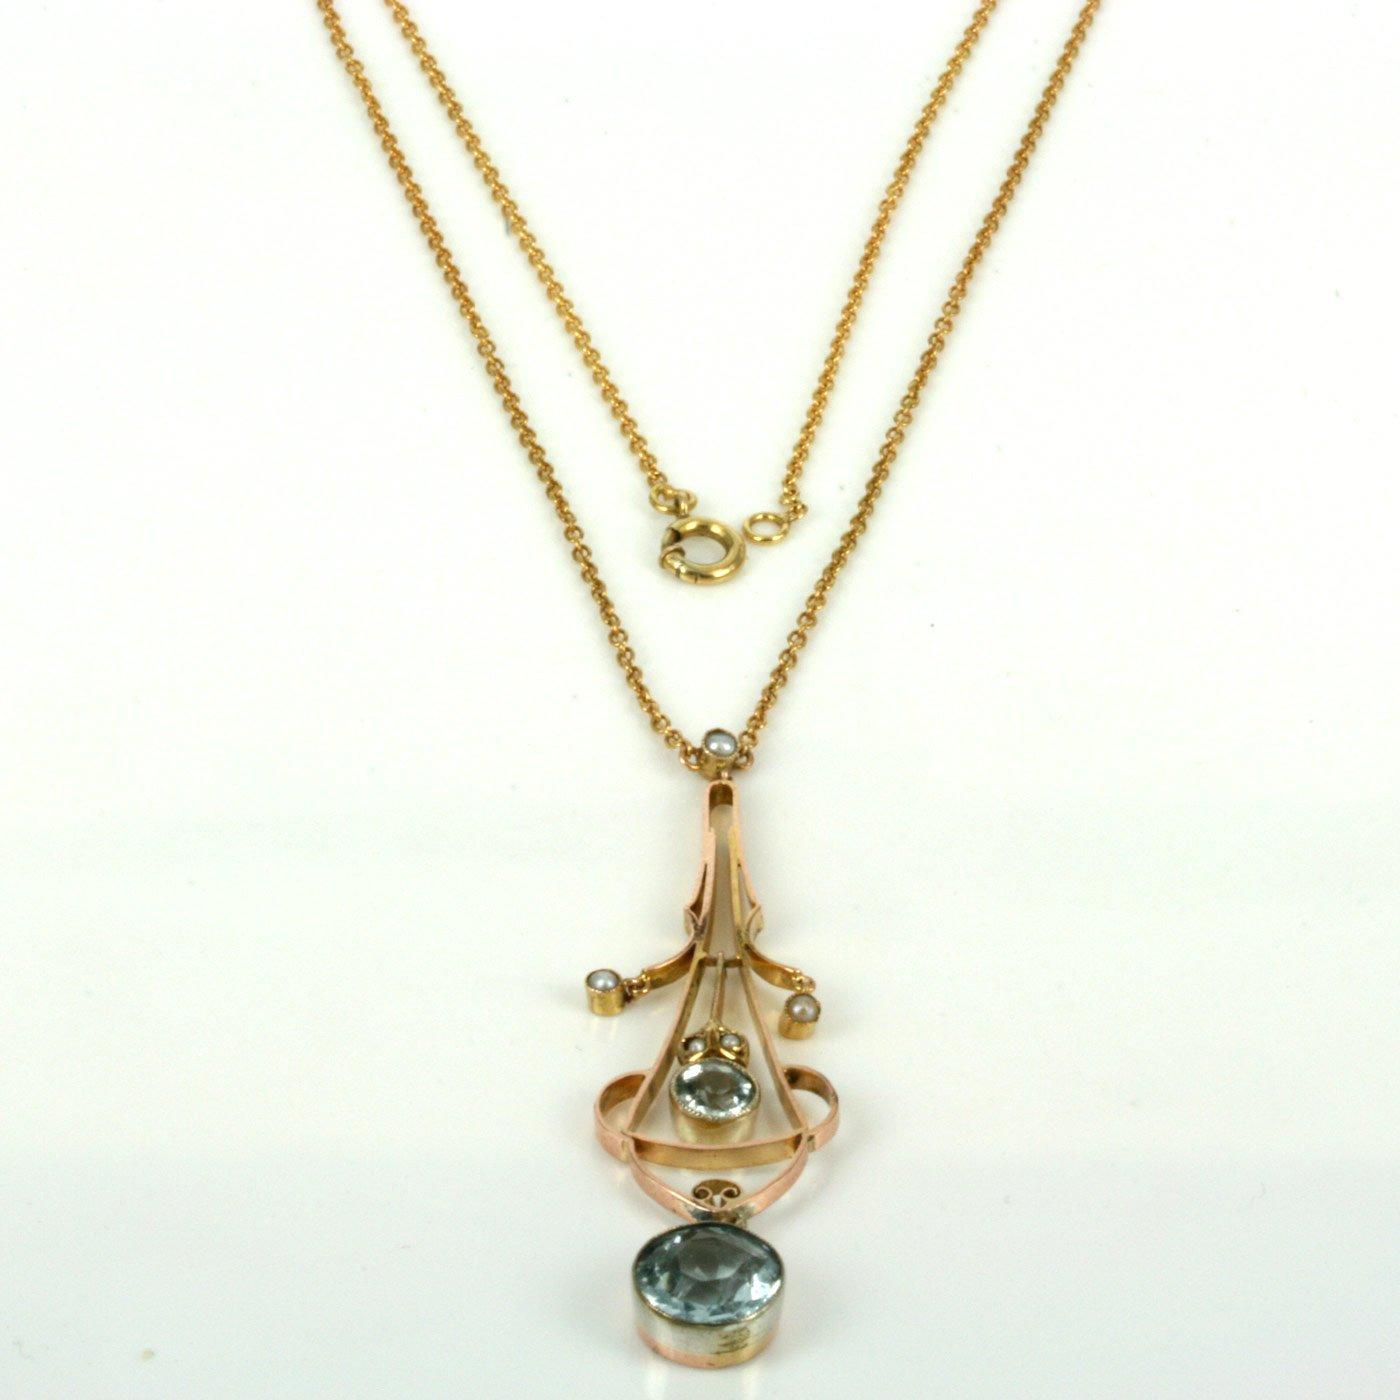 Aquamarine Necklaces: Buy Antique Edwardian Era Aquamarine And Pearl Necklace